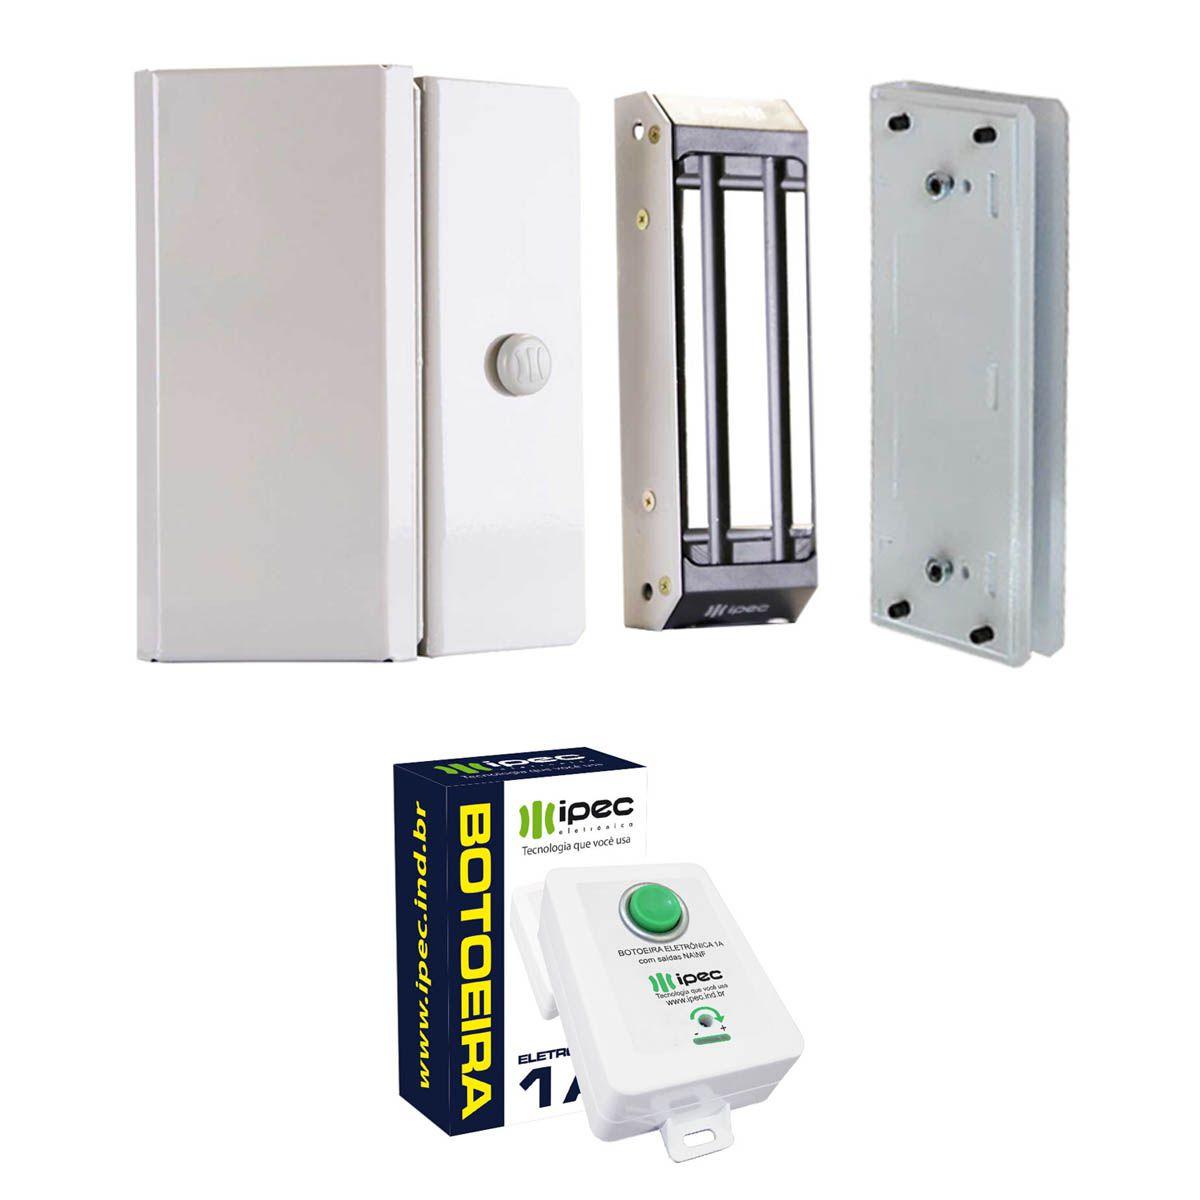 Kit Fechadura Magnética M150 Porta Vidro com Botoeira Eletrônica